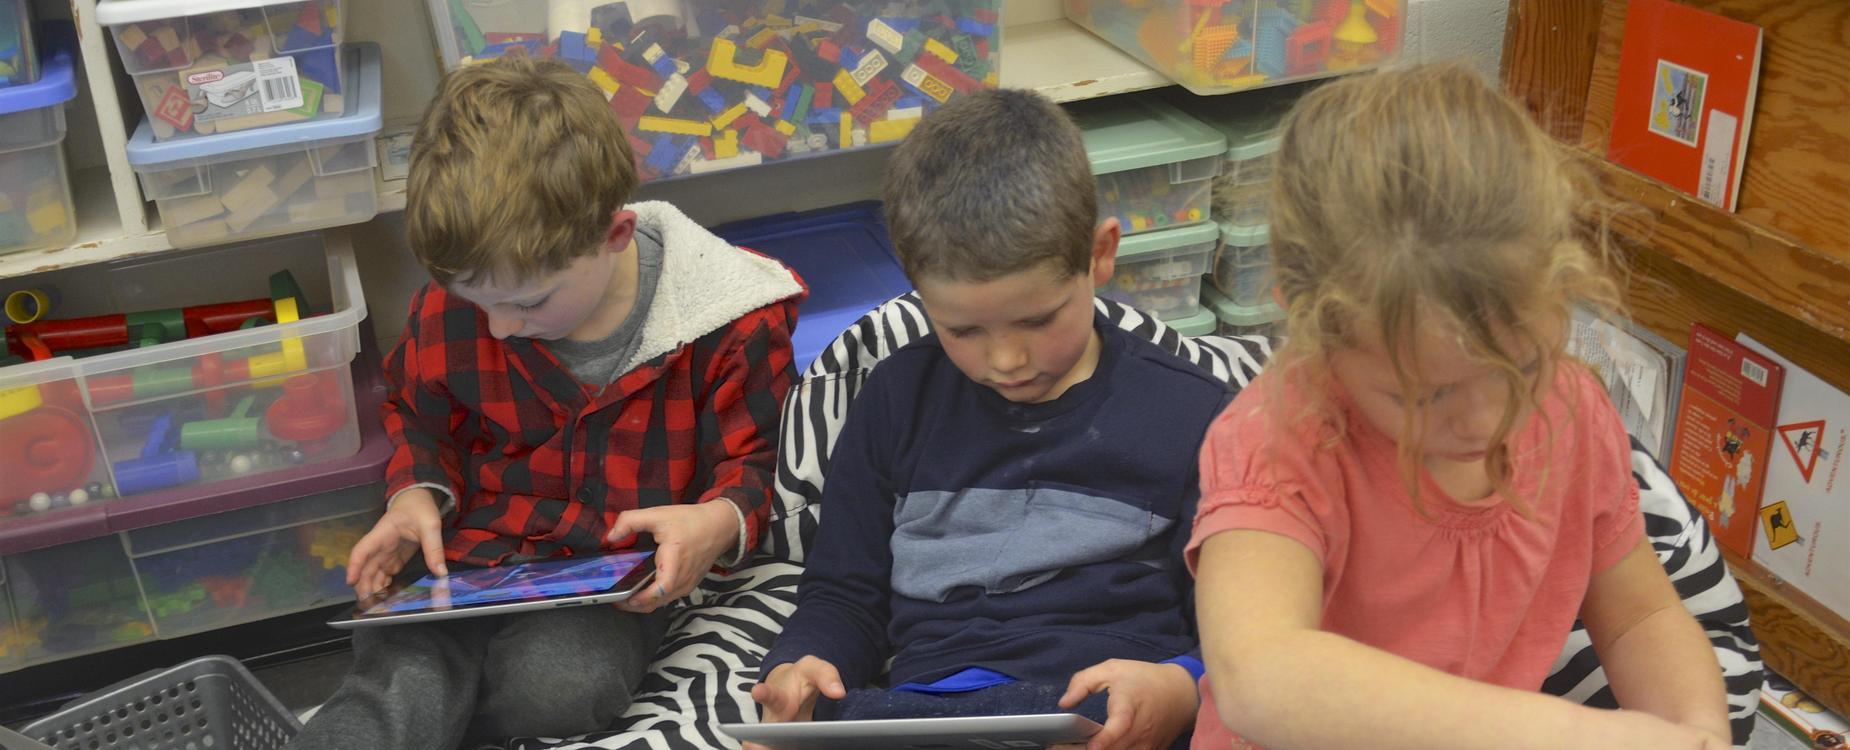 students using ipad